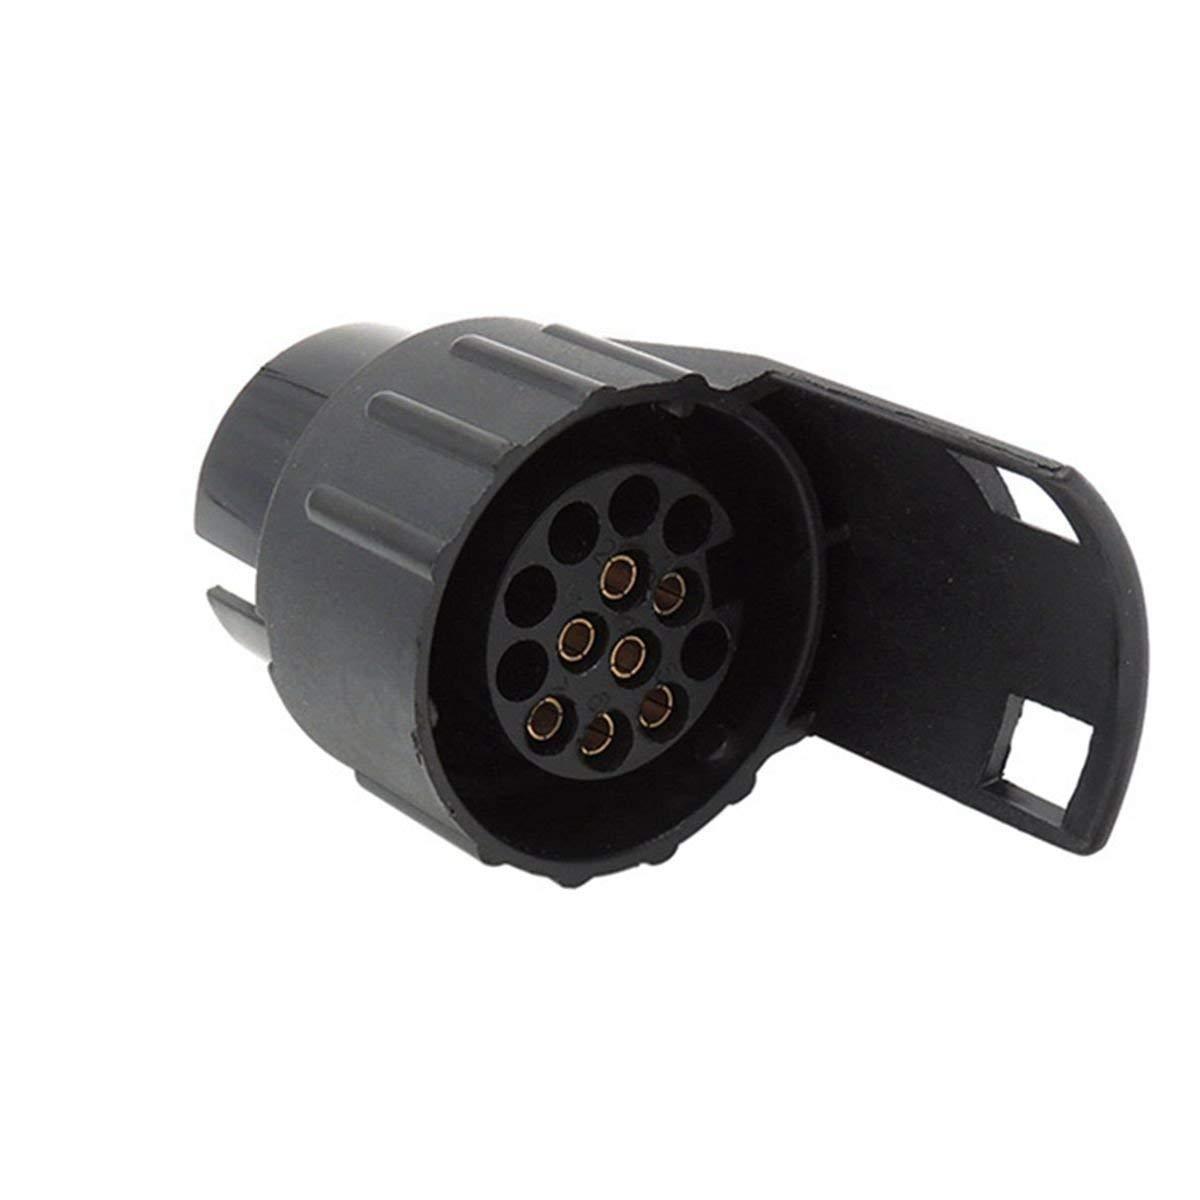 Adaptador el/éctrico Impermeable para Remolque de 7 a 13 Pines Jebester